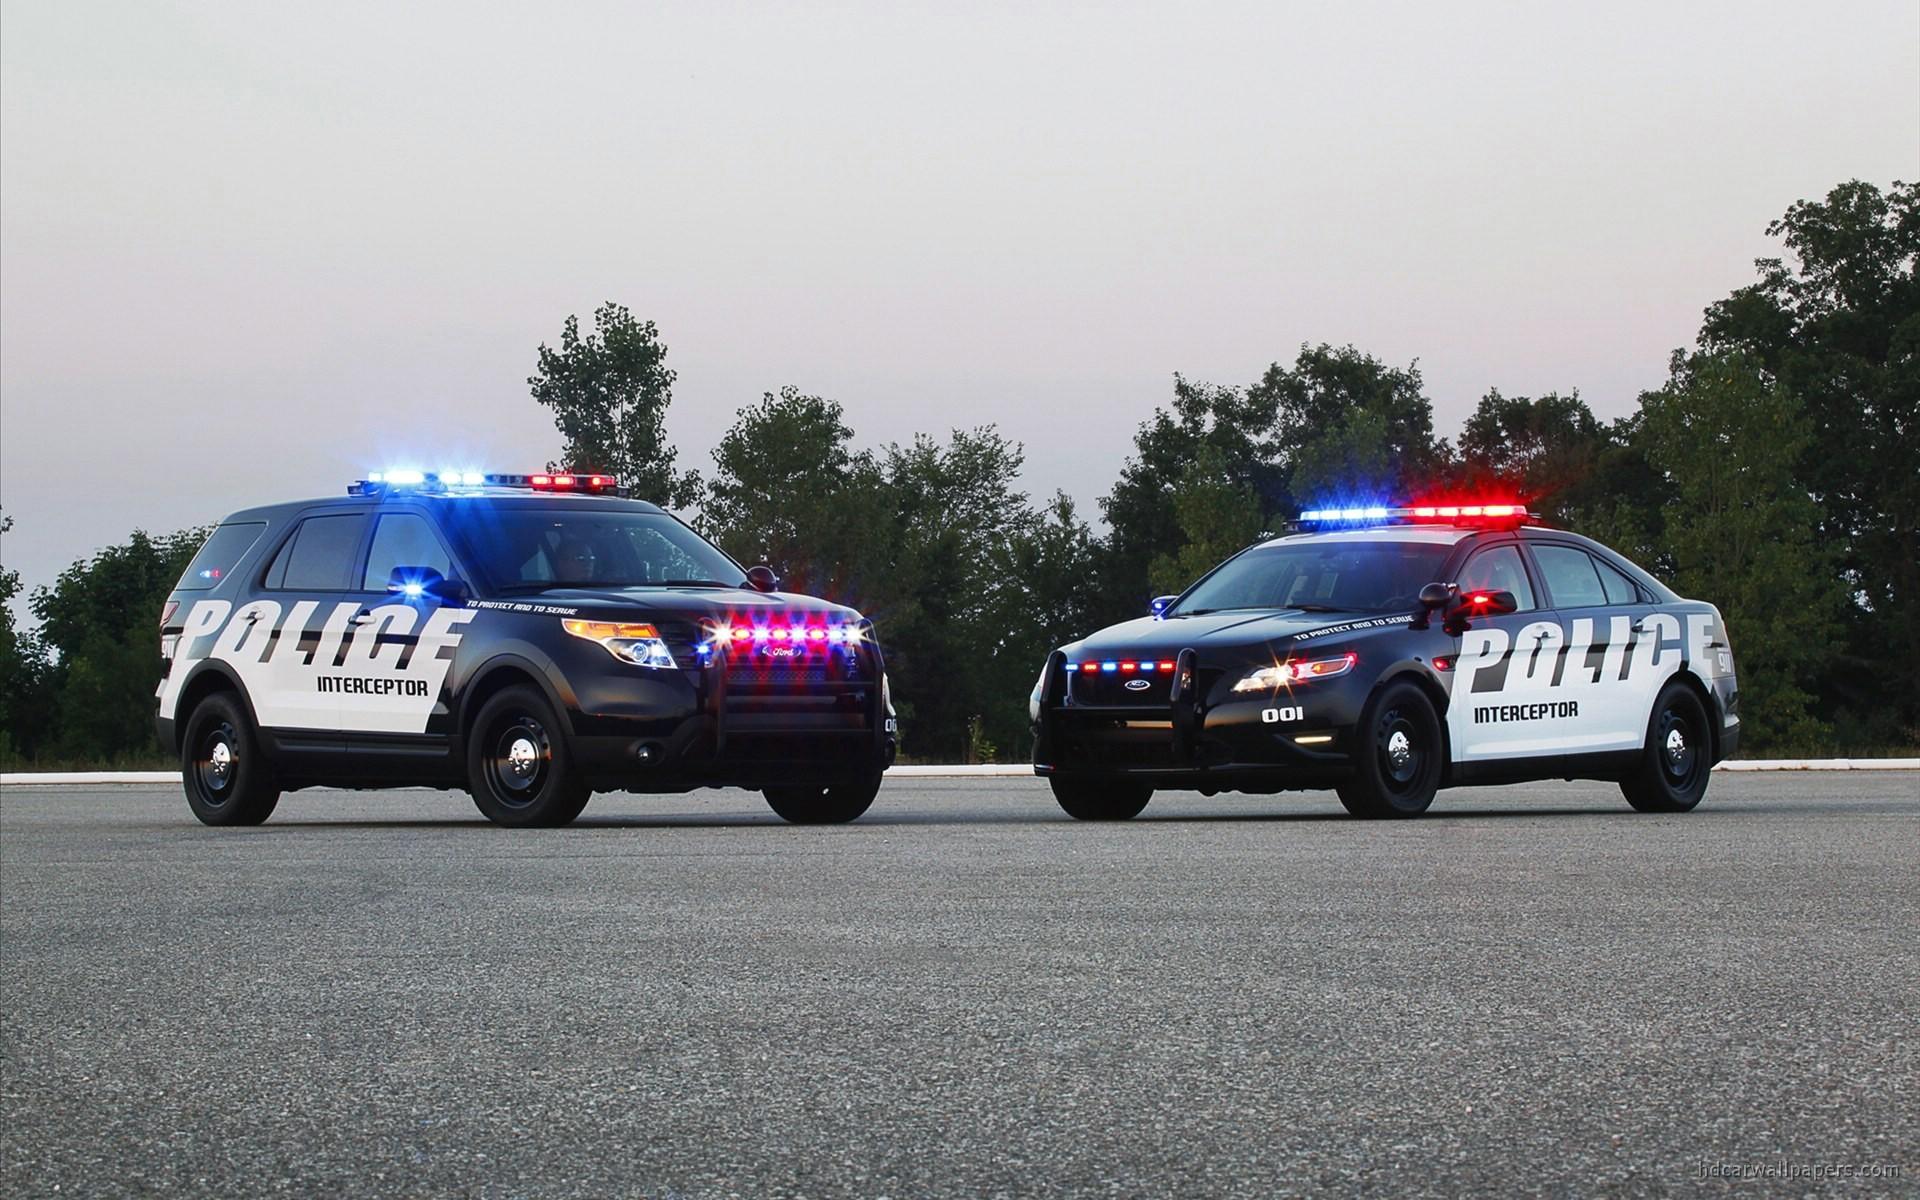 Police Car 4k Wallpaper 2011 Ford Police Interceptor Suv Wallpaper Hd Car